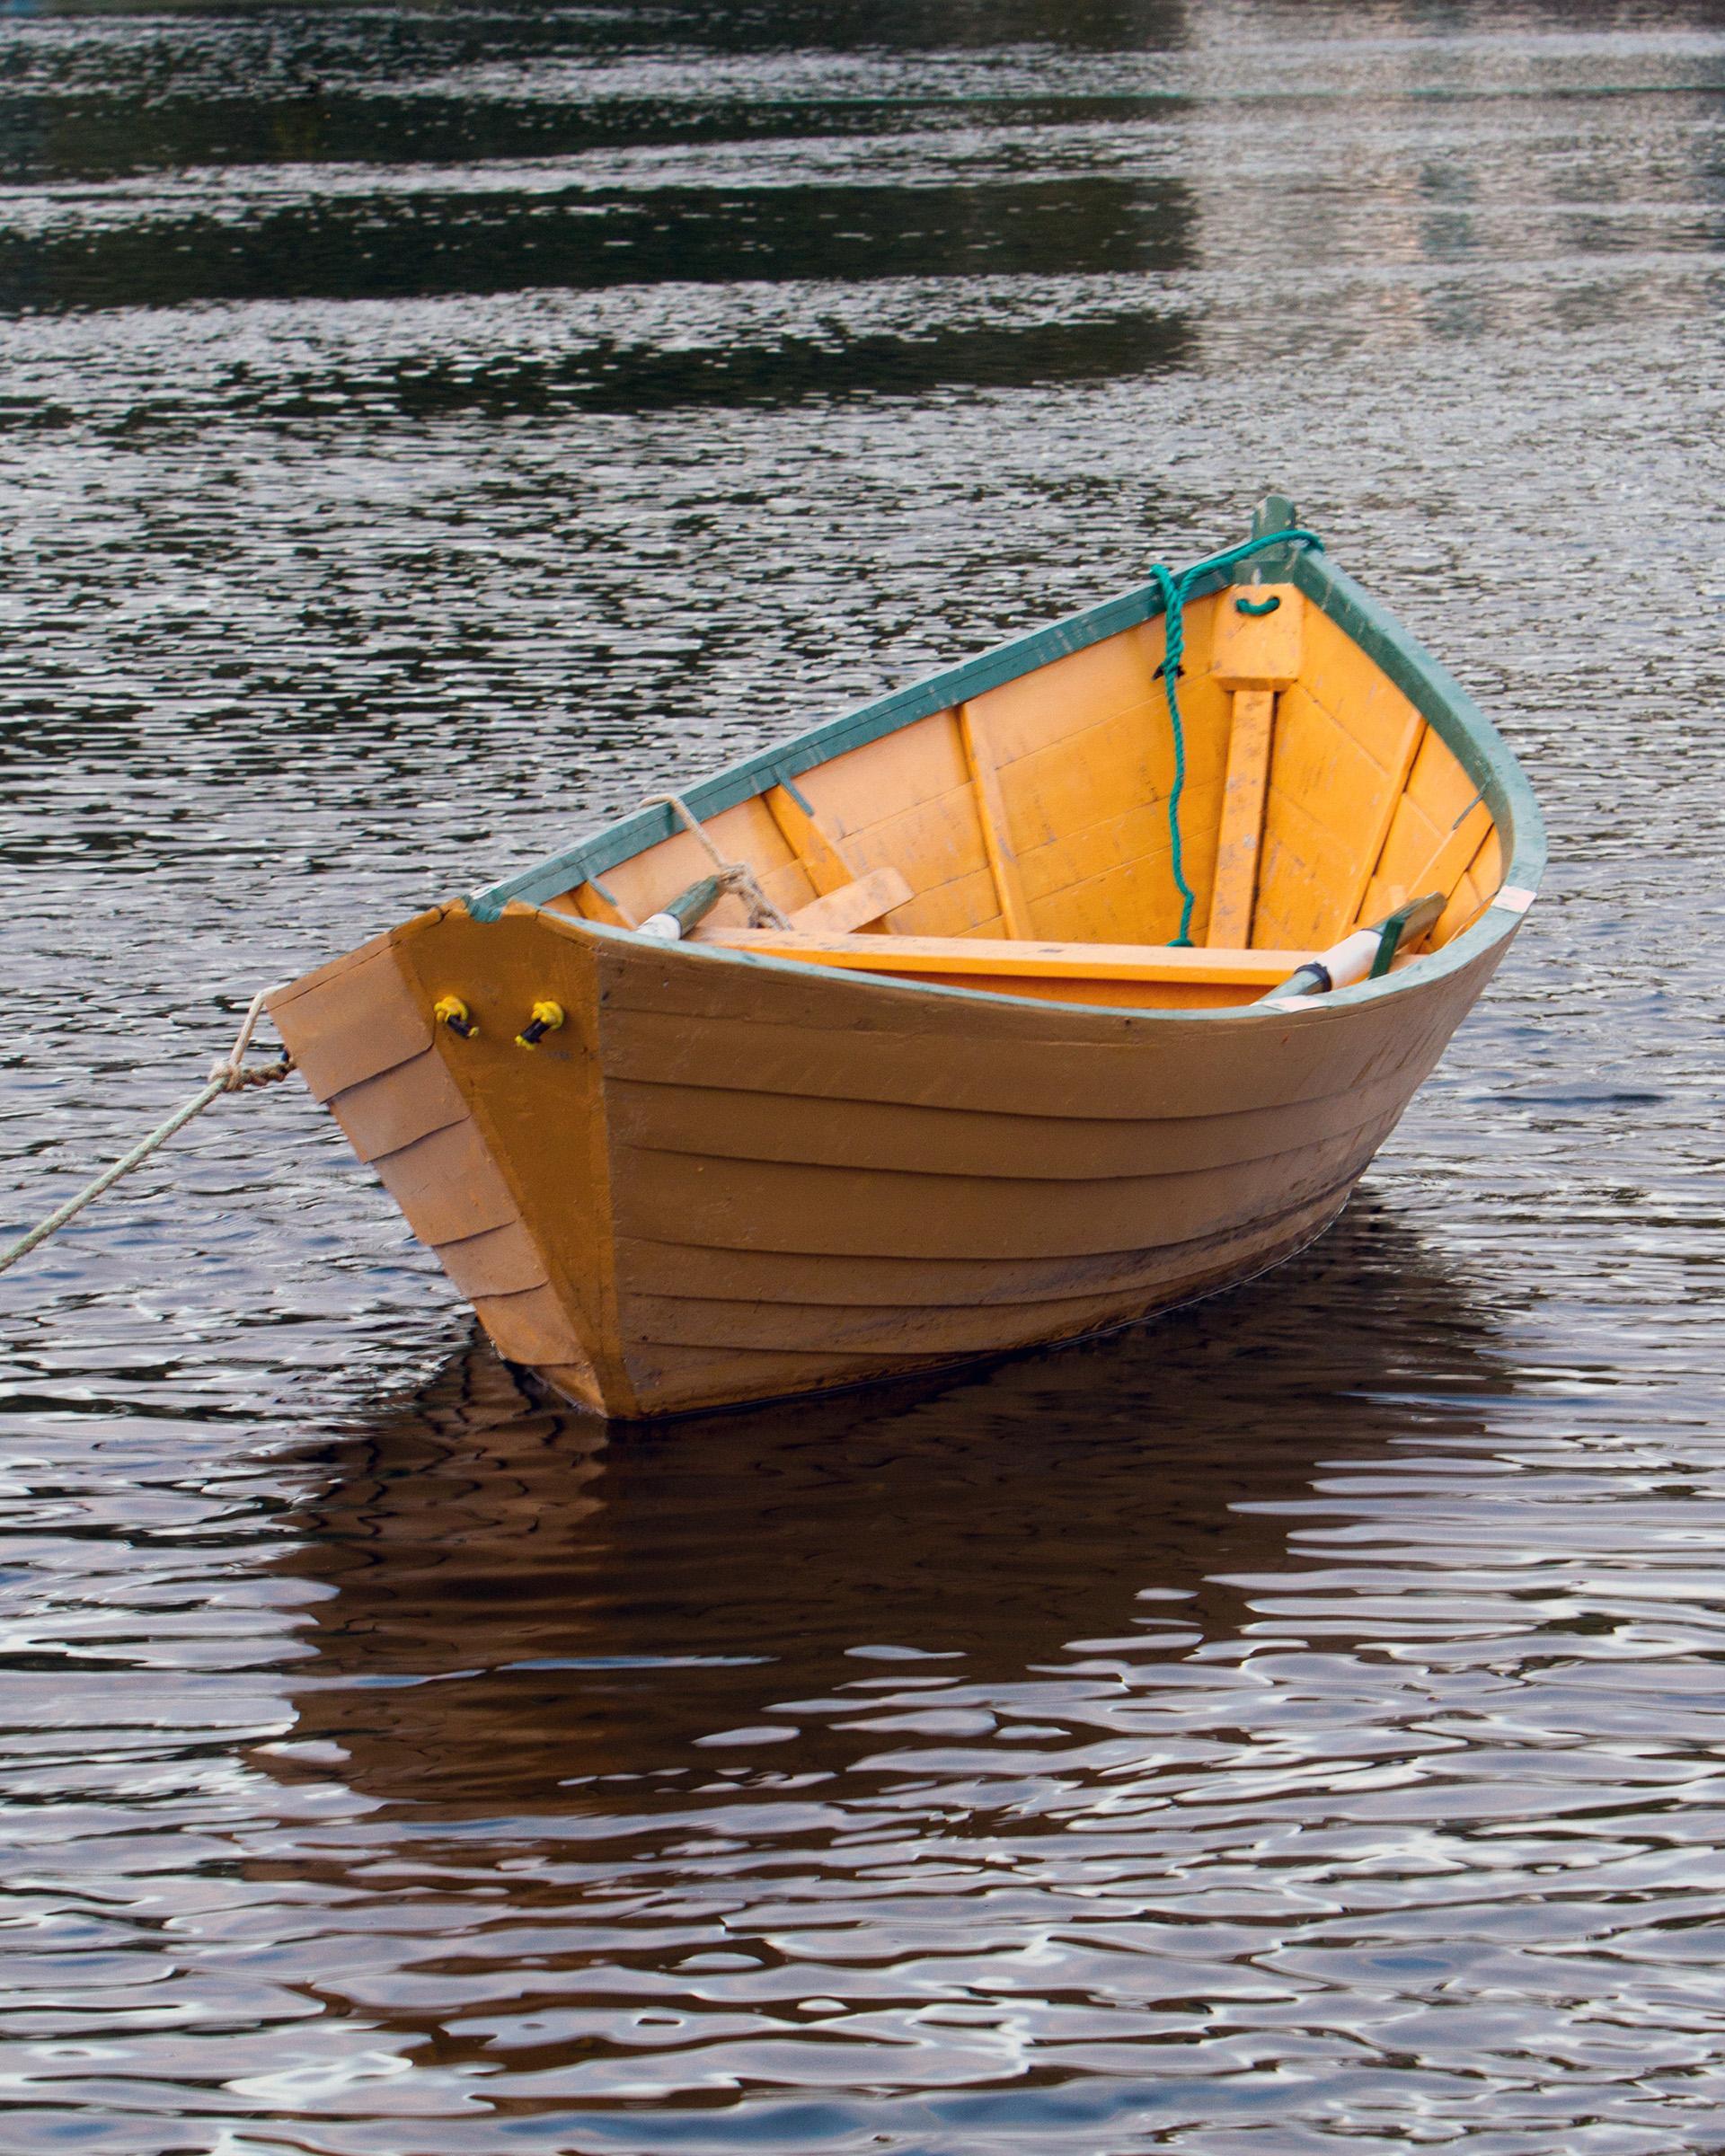 Dory, Anchor, Skiff, Rowboat, Rowing, HQ Photo